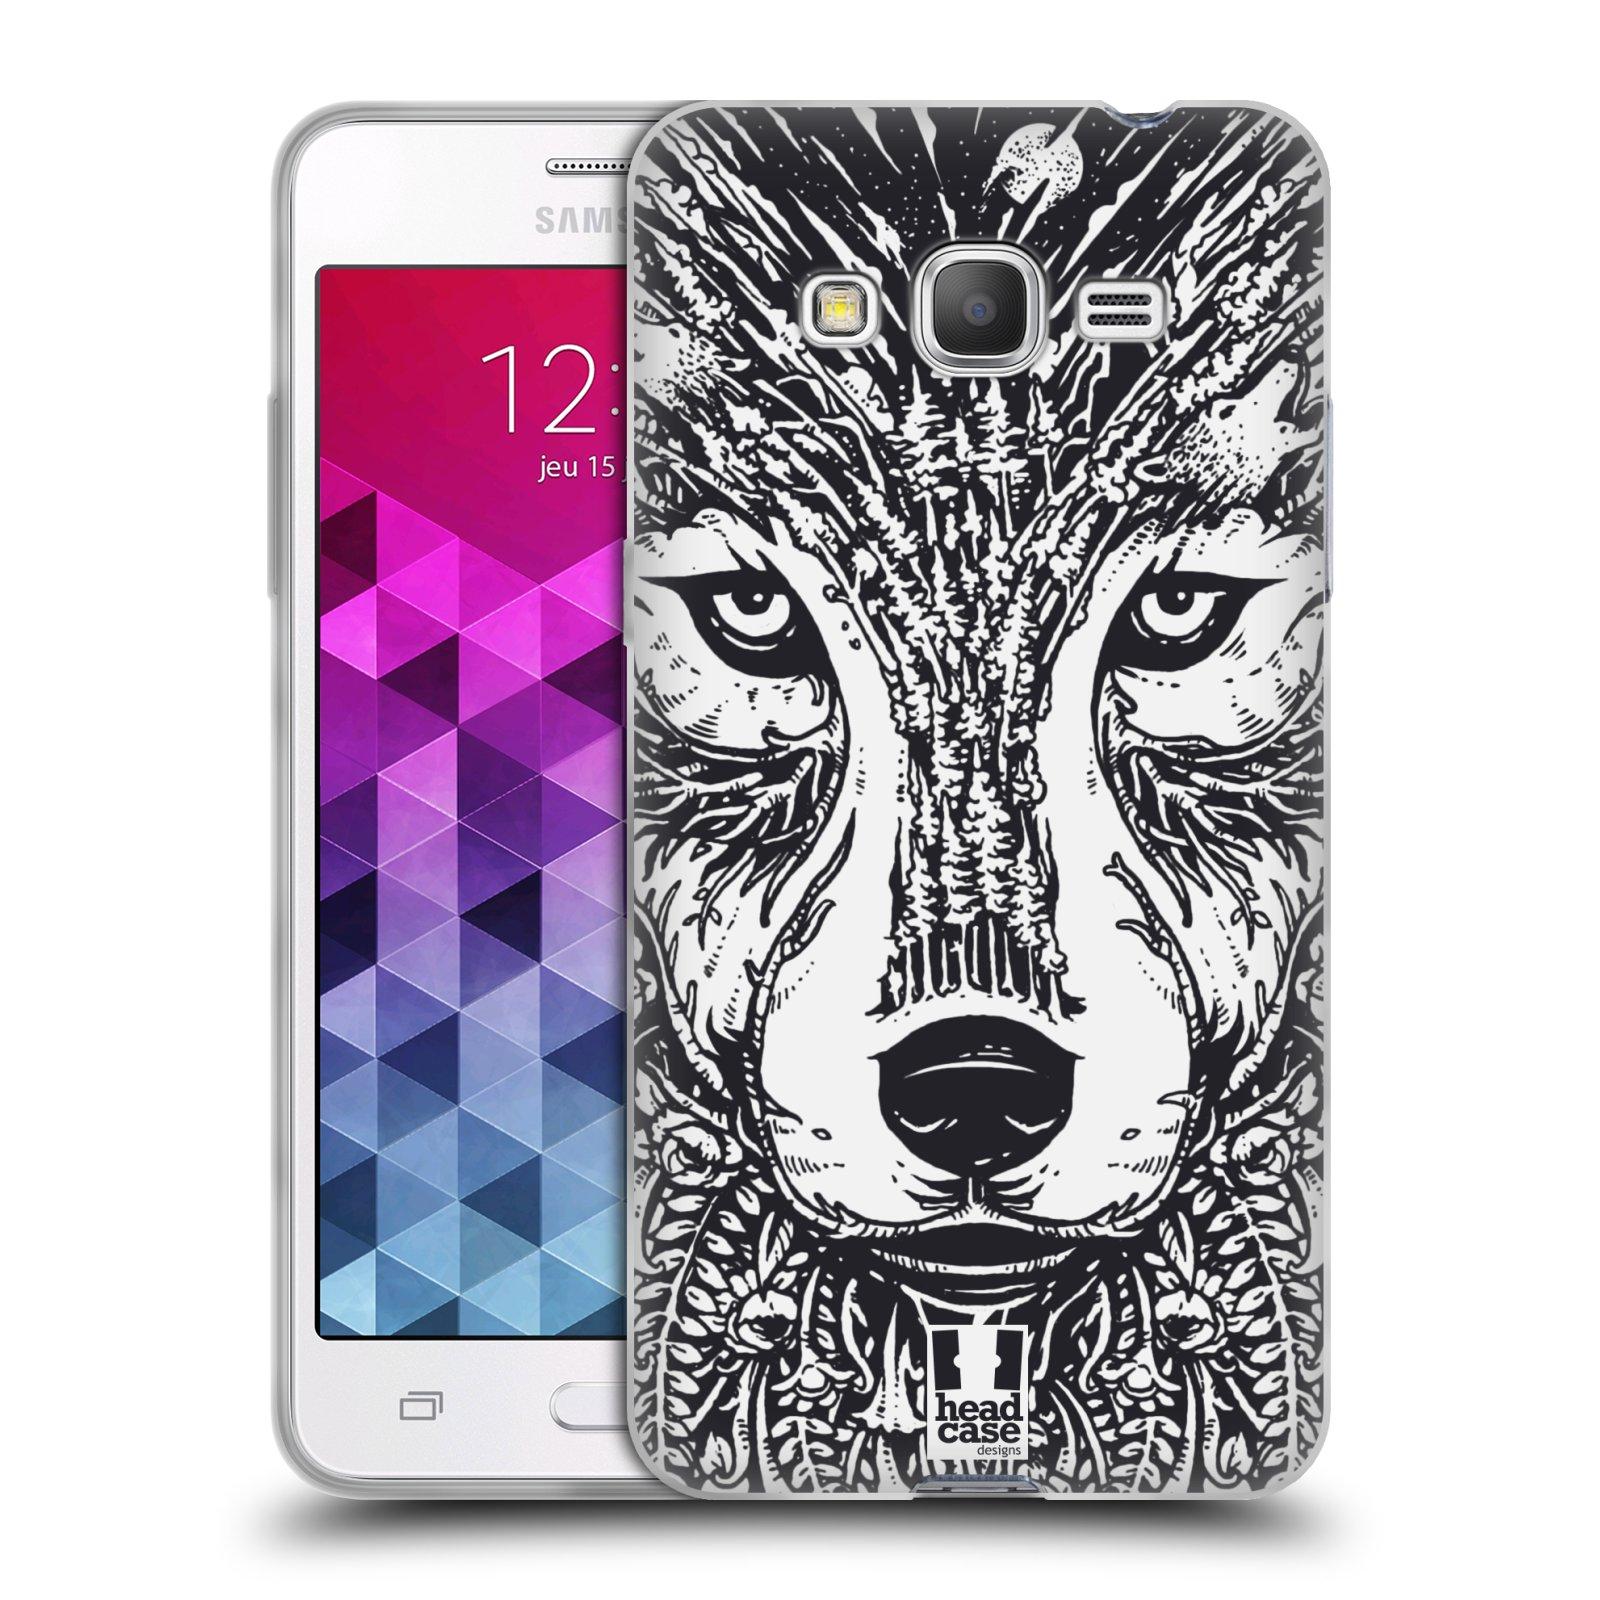 Silikonové pouzdro na mobil Samsung Galaxy Grand Prime HEAD CASE DOODLE TVÁŘ VLK